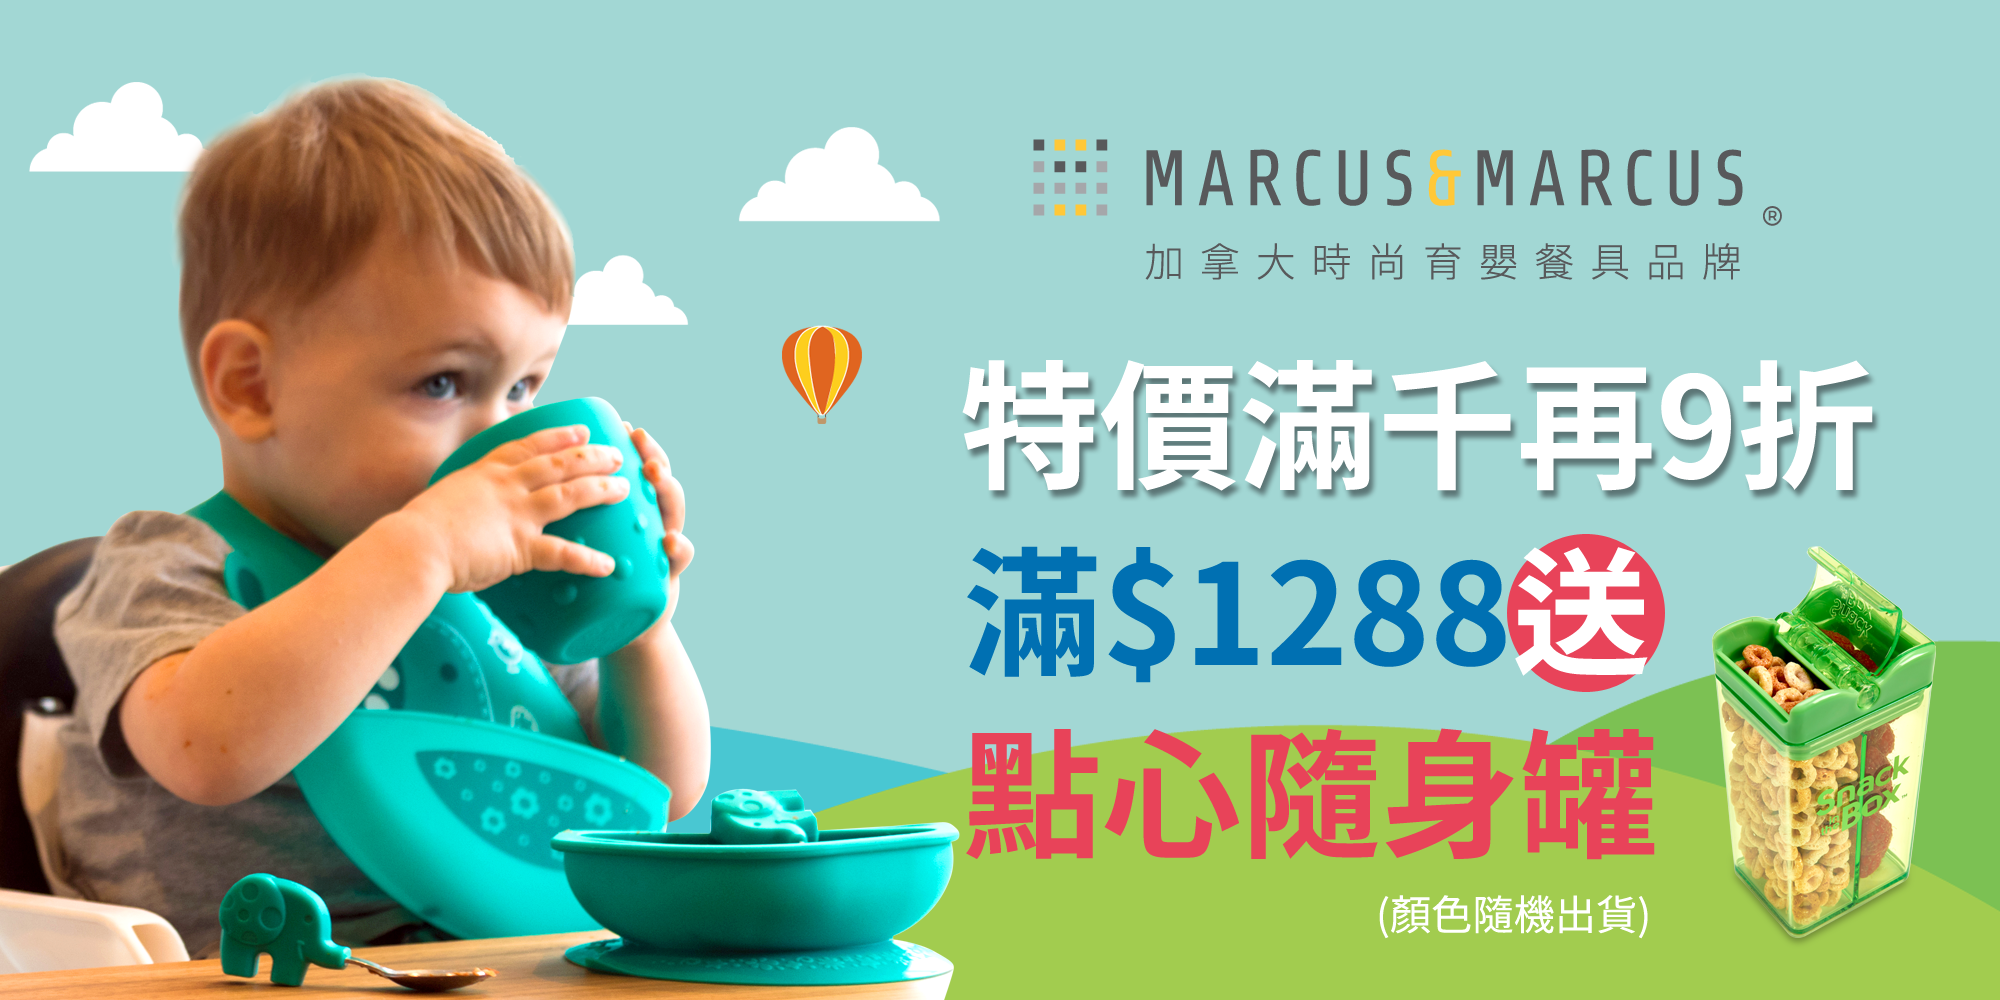 marcus&marcus滿1288送點心隨身罐